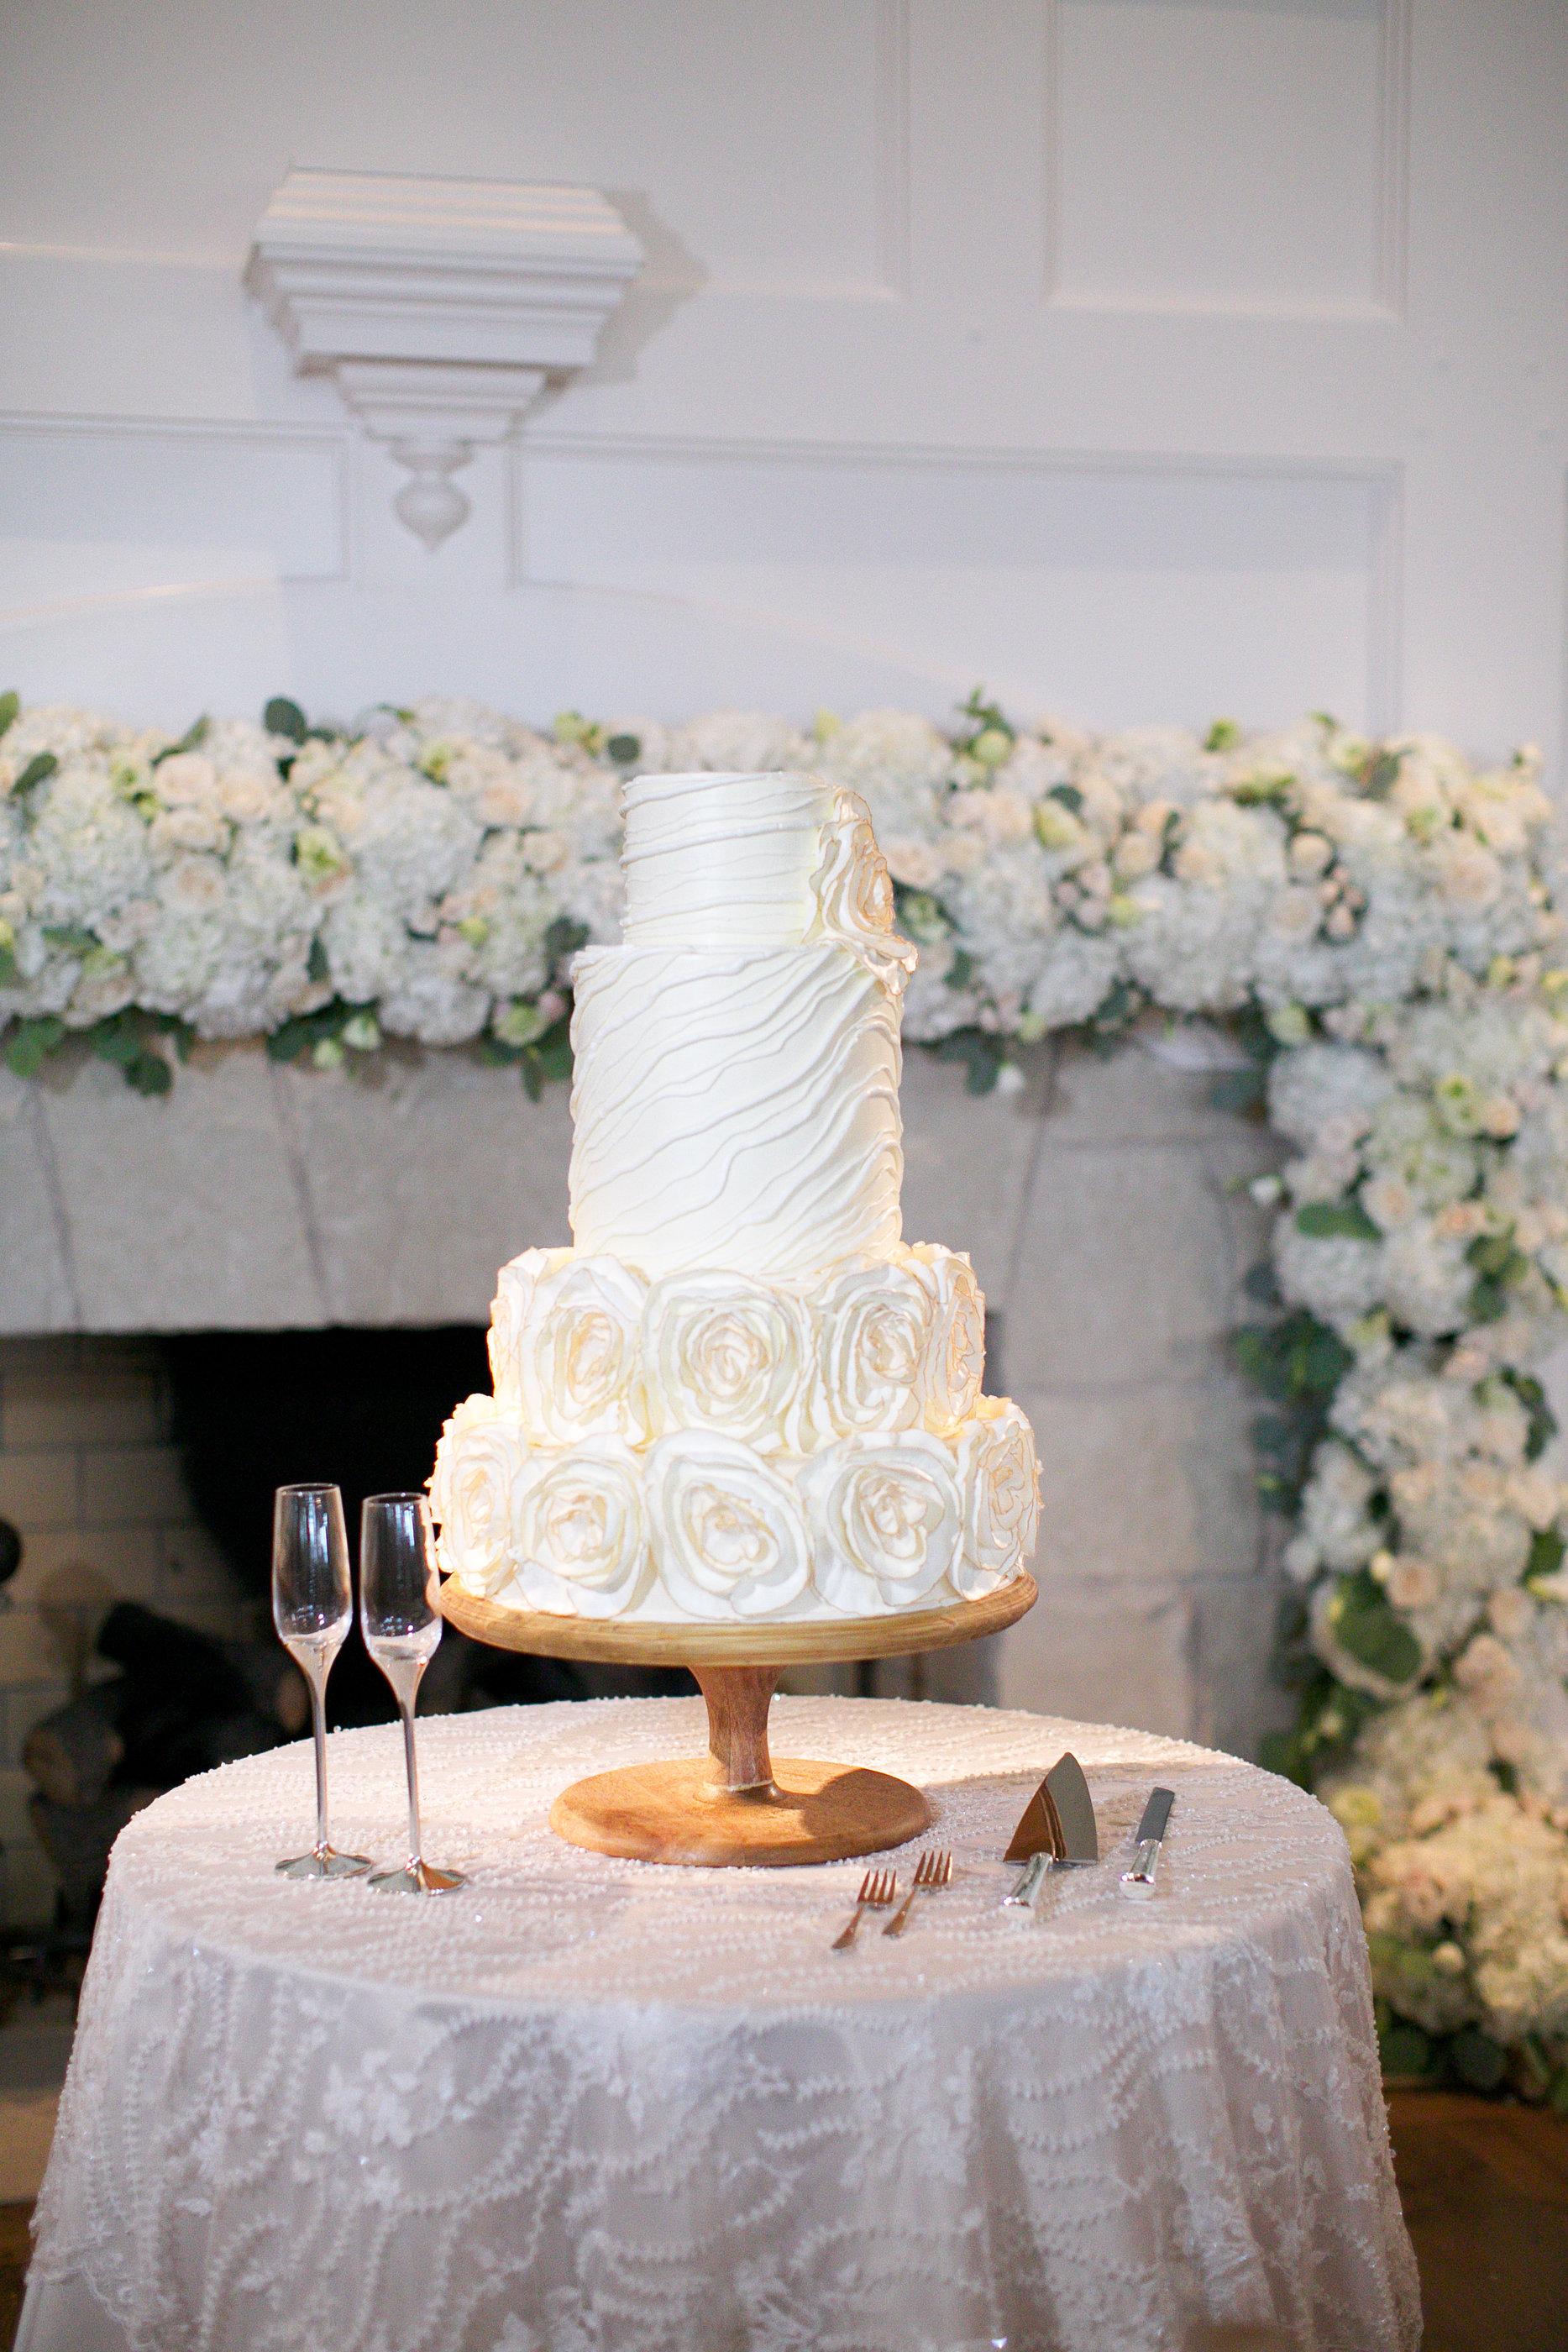 Cake Details - Kiawah Island, South Carolina - Fall Wedding - Julian Leaver Events